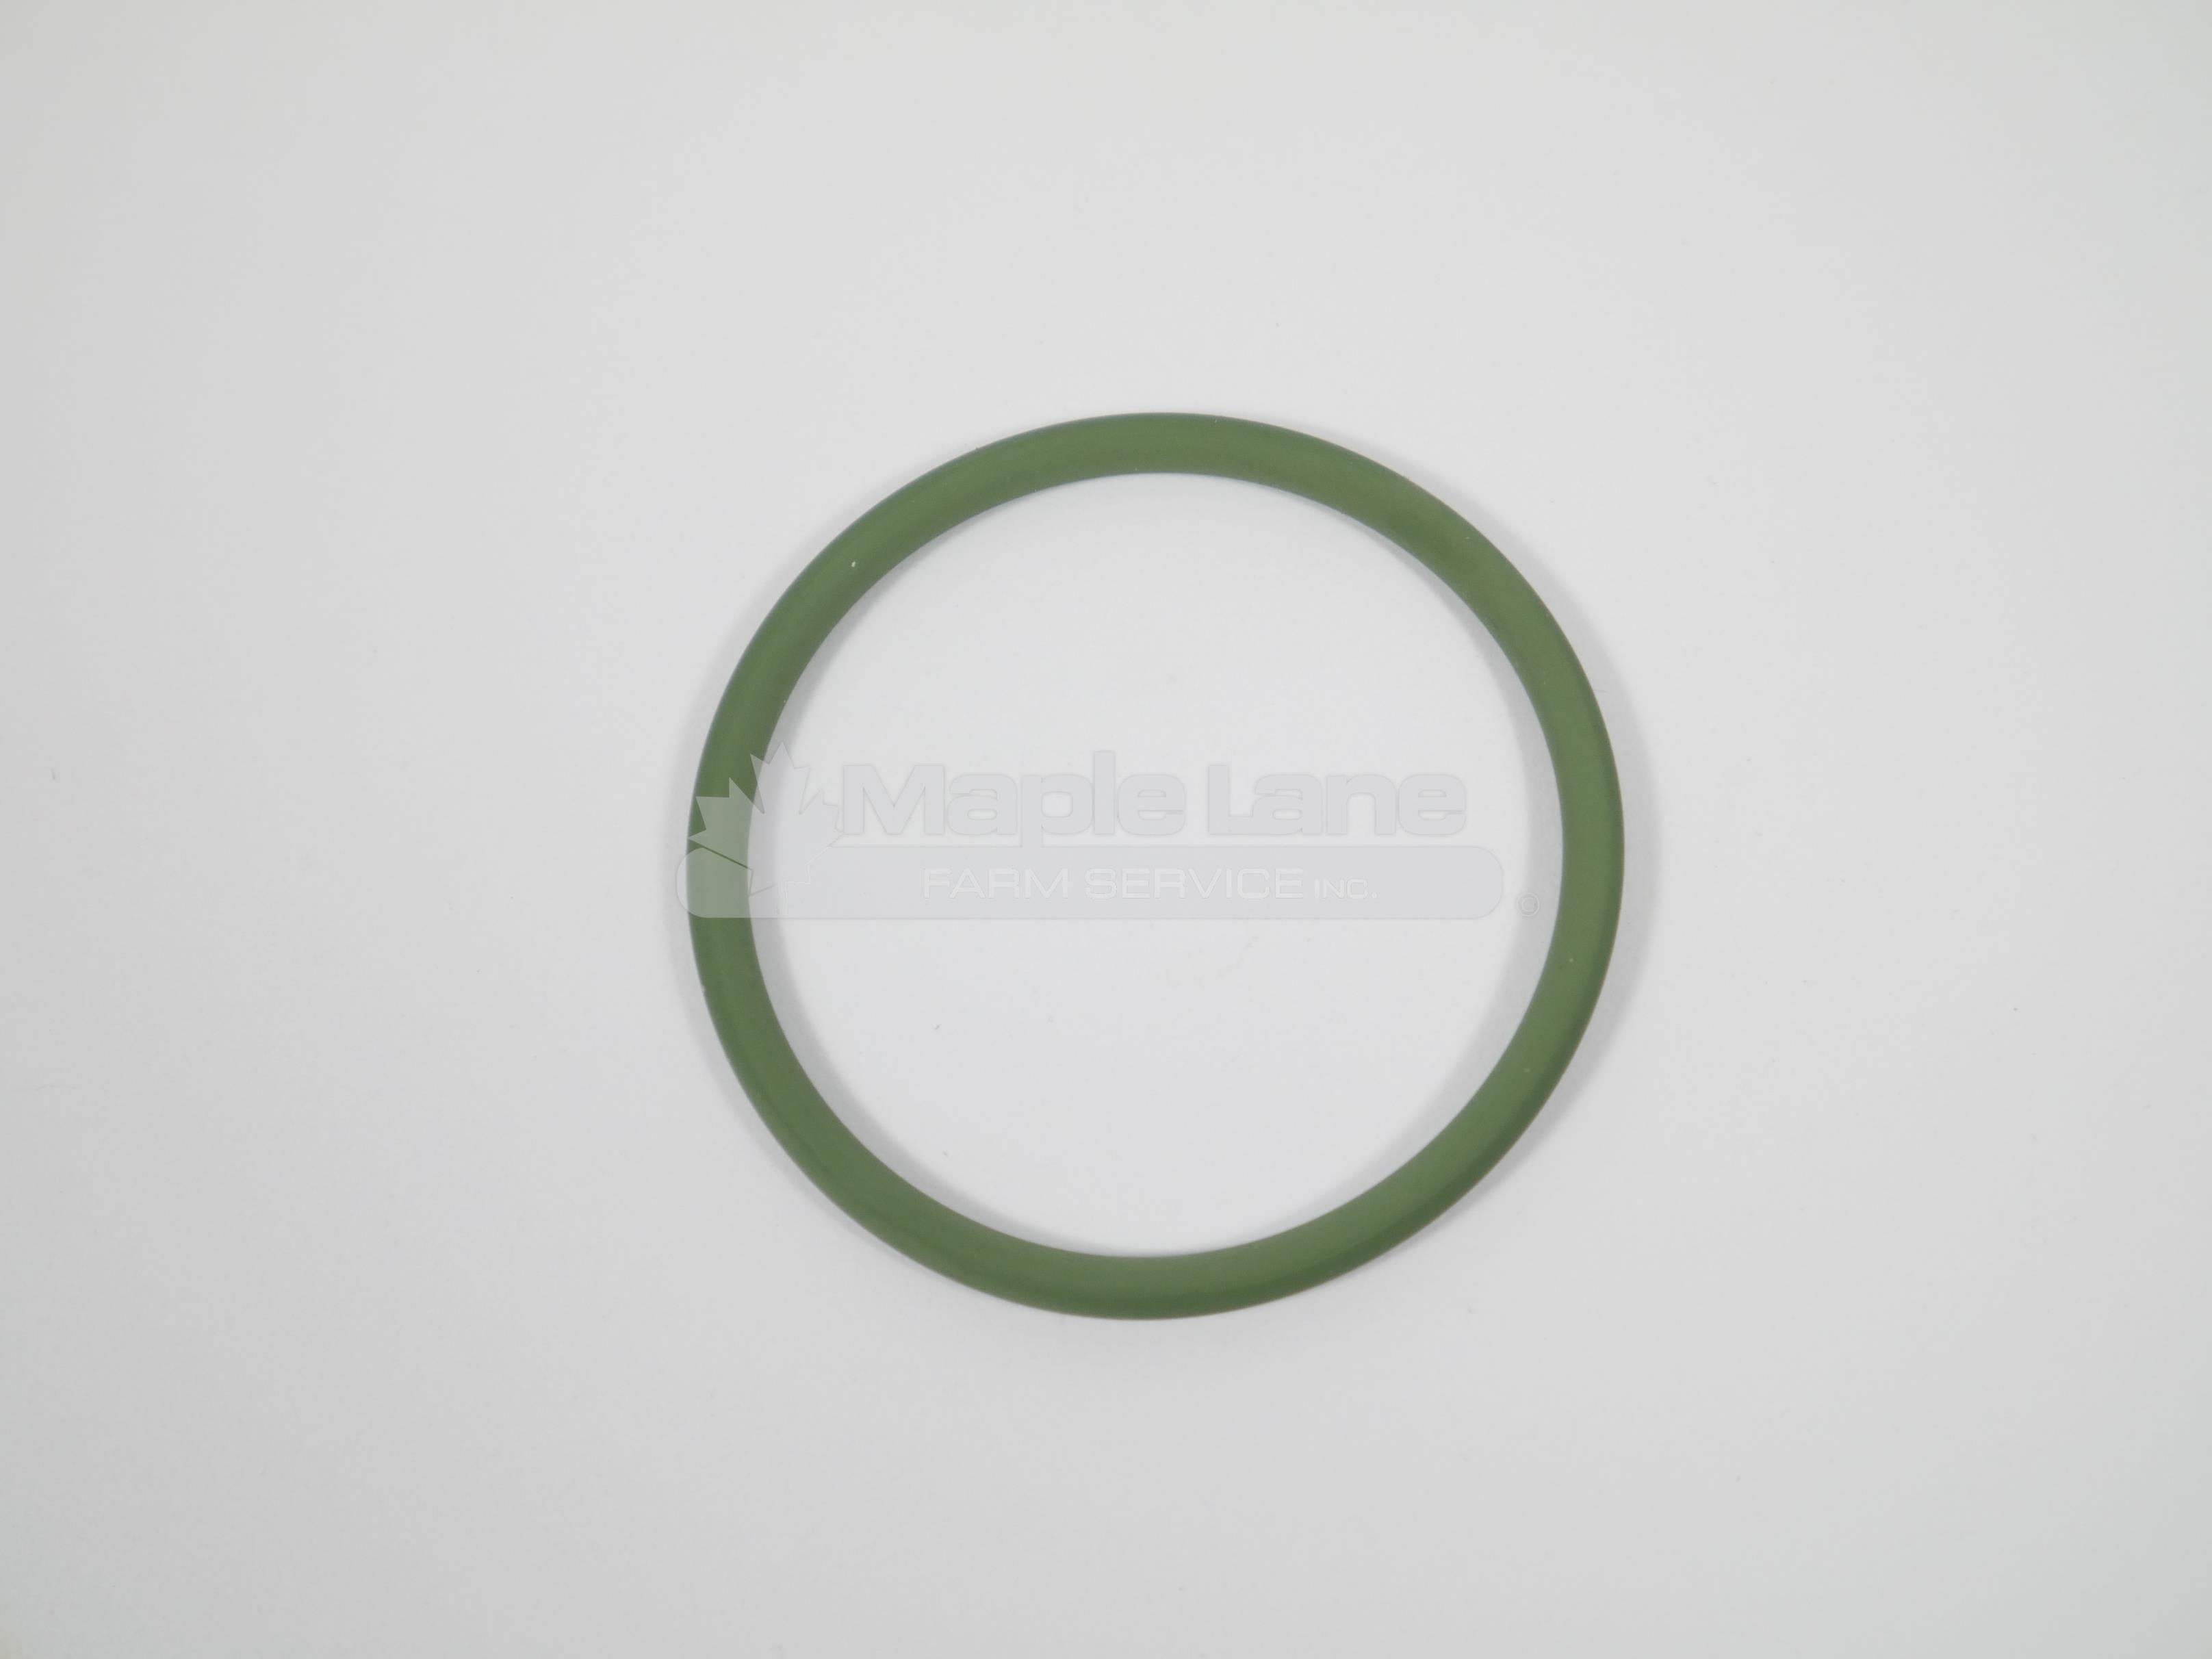 242020 O-Ring